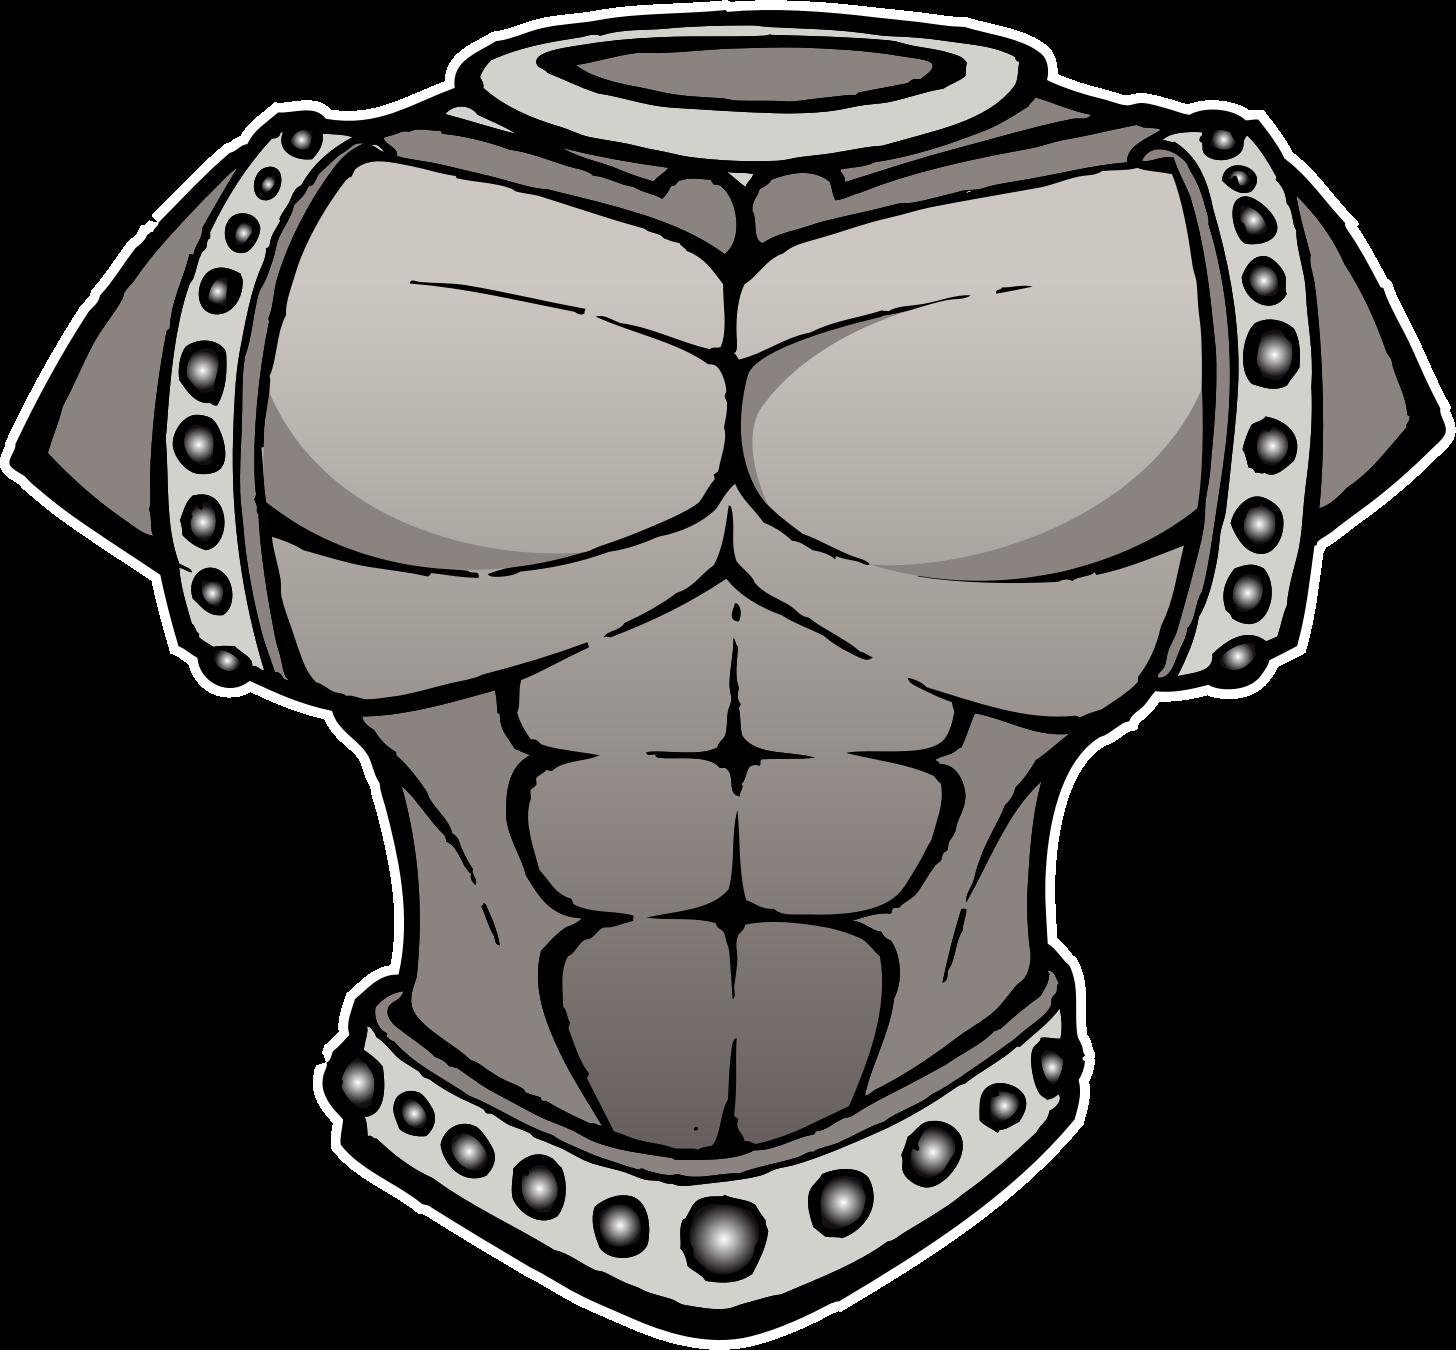 Clipart Raseone Armor 1